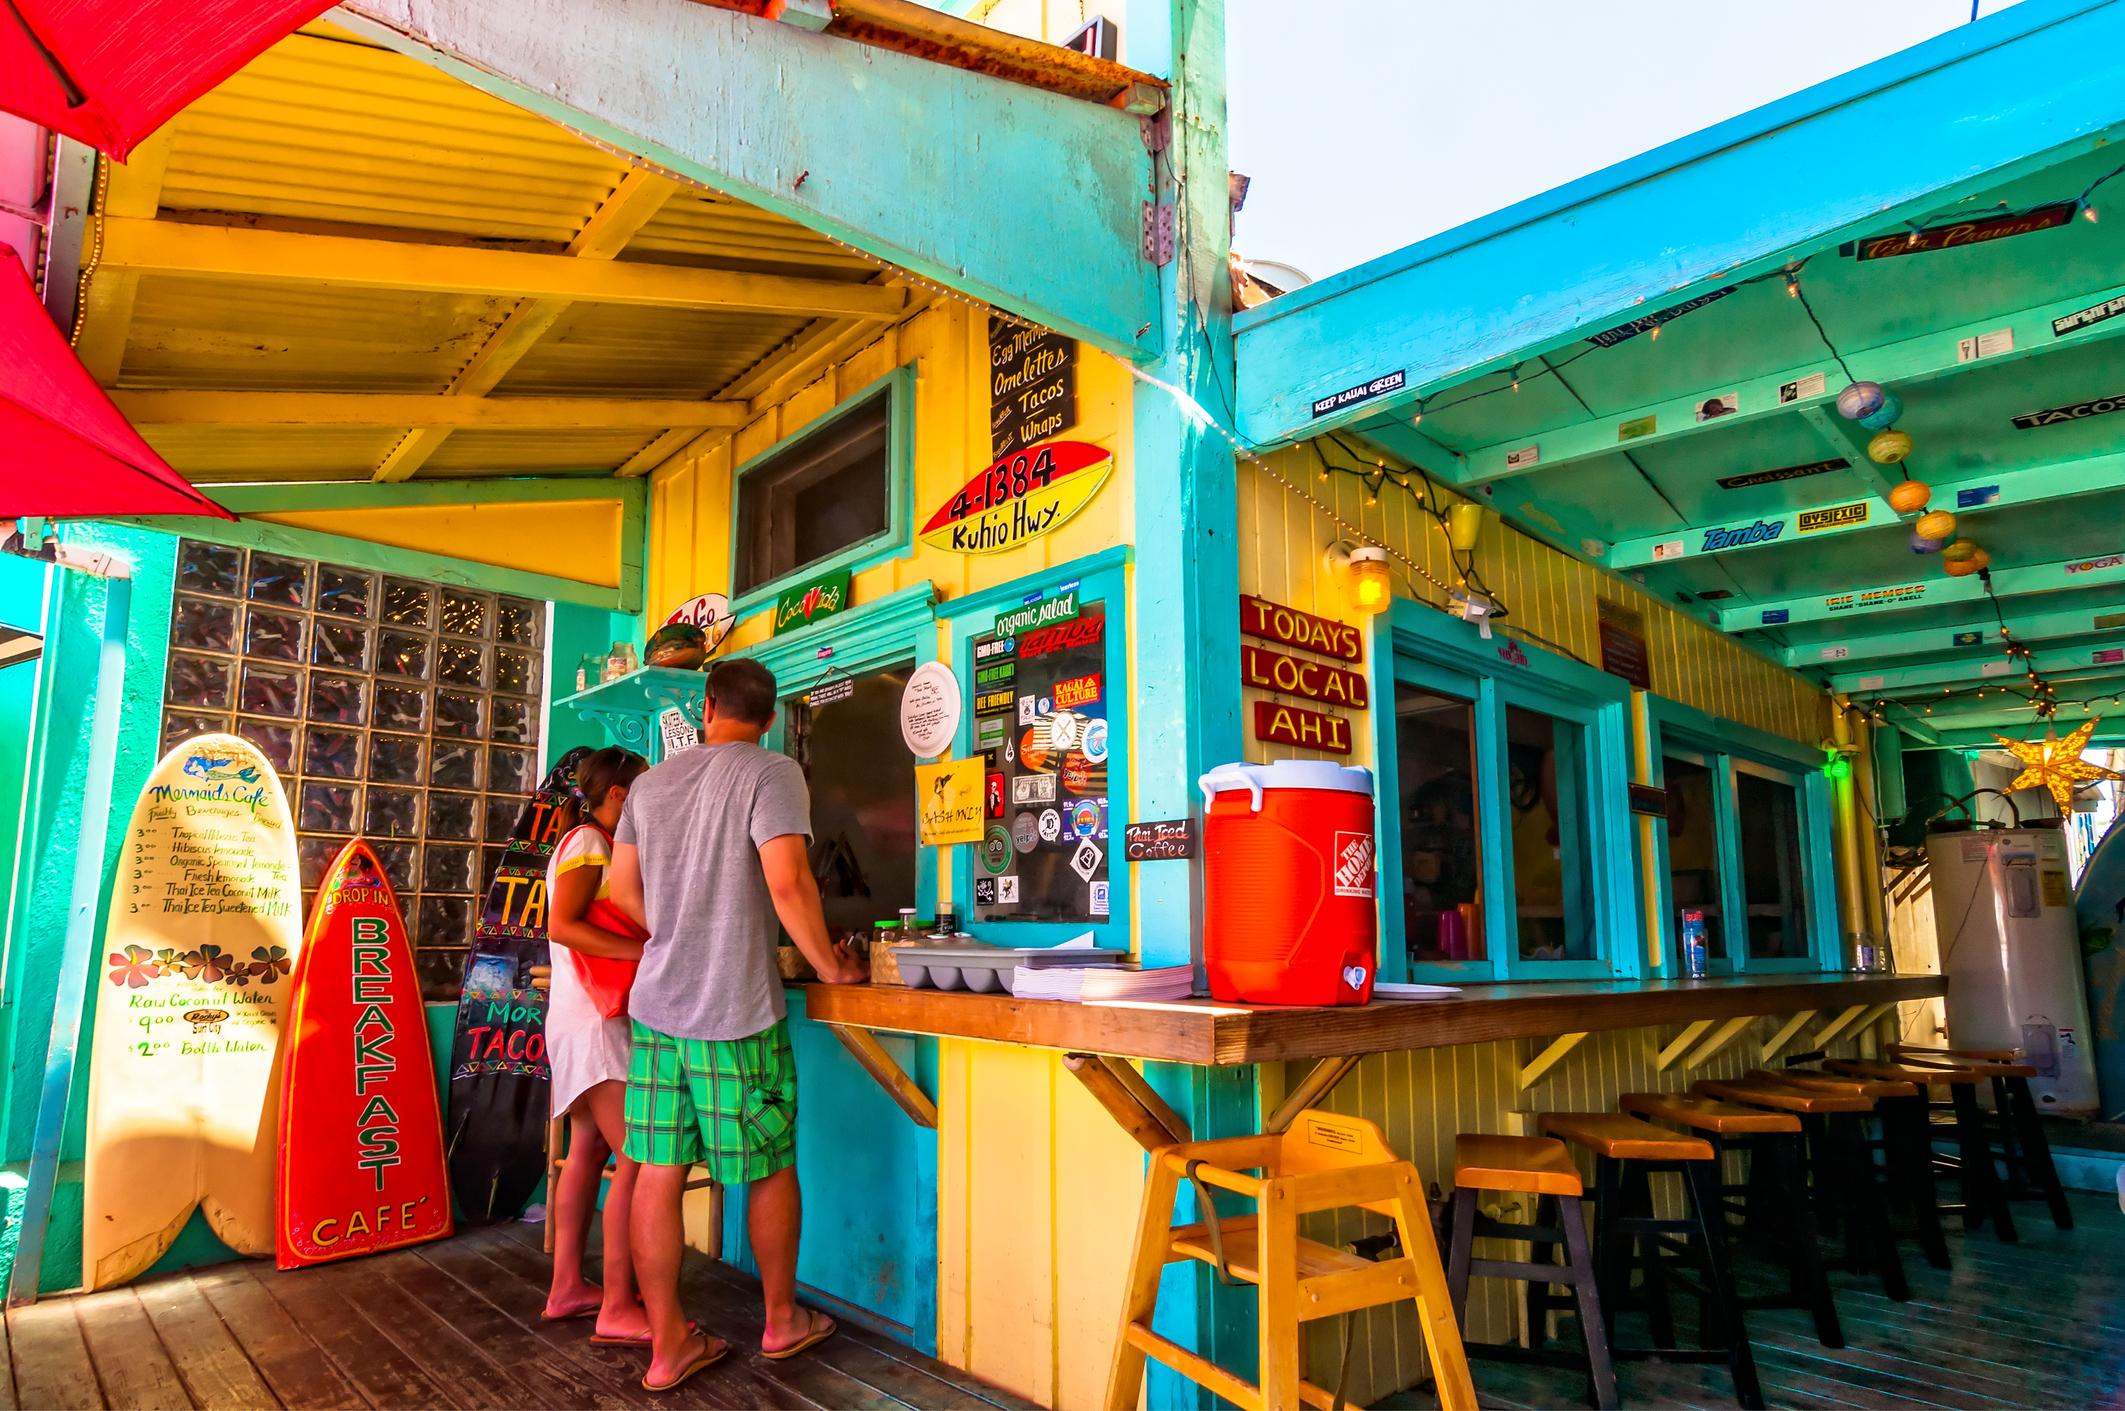 picturesque Mermaids Cafe in Kapaa, Kauai